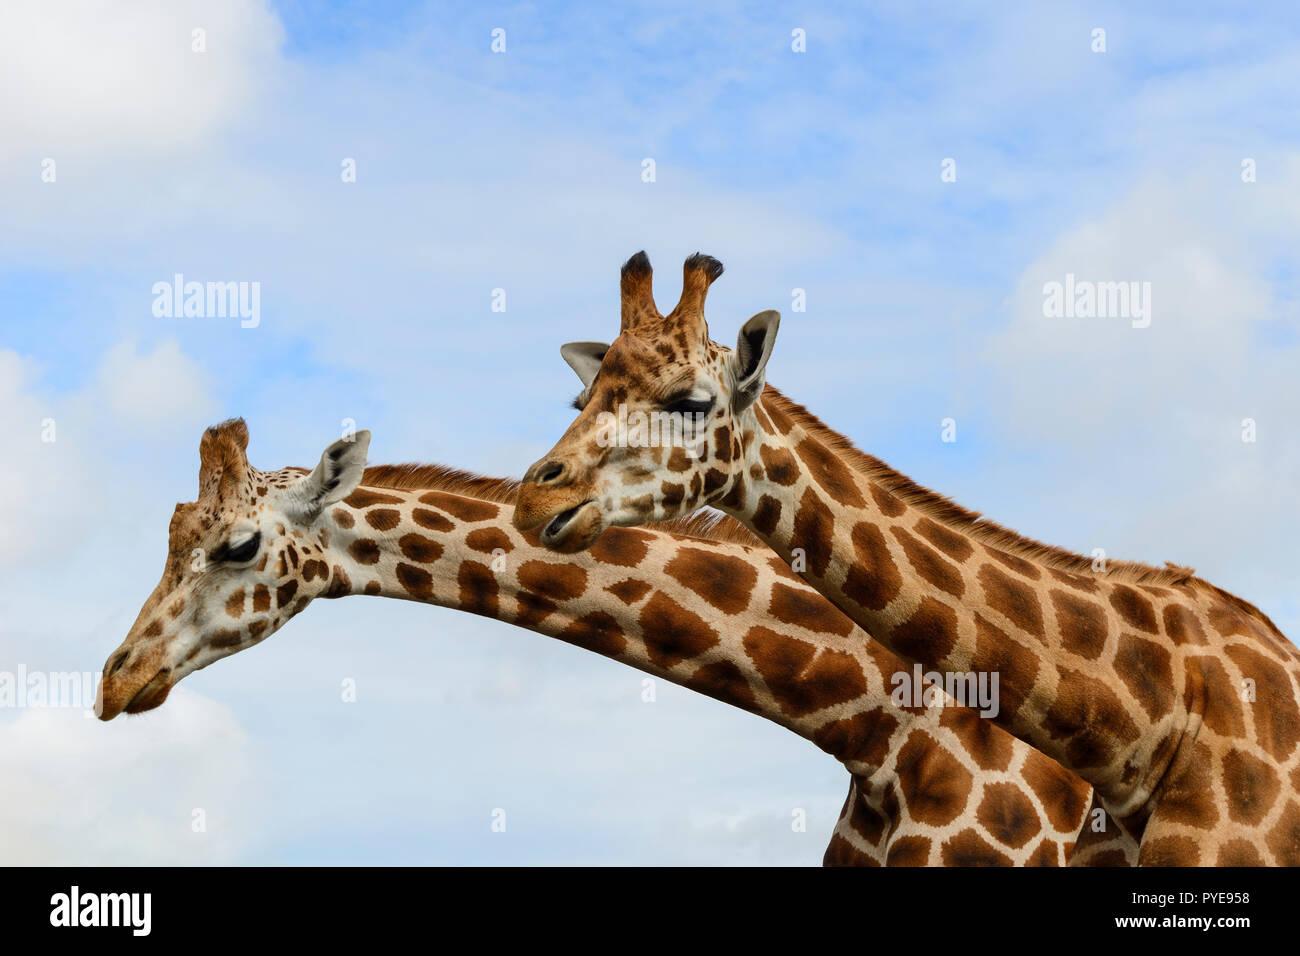 Two female Rothschild's giraffes at Fota Wildlife Park near Cobh, County Cork, Republic of Ireland - Stock Image